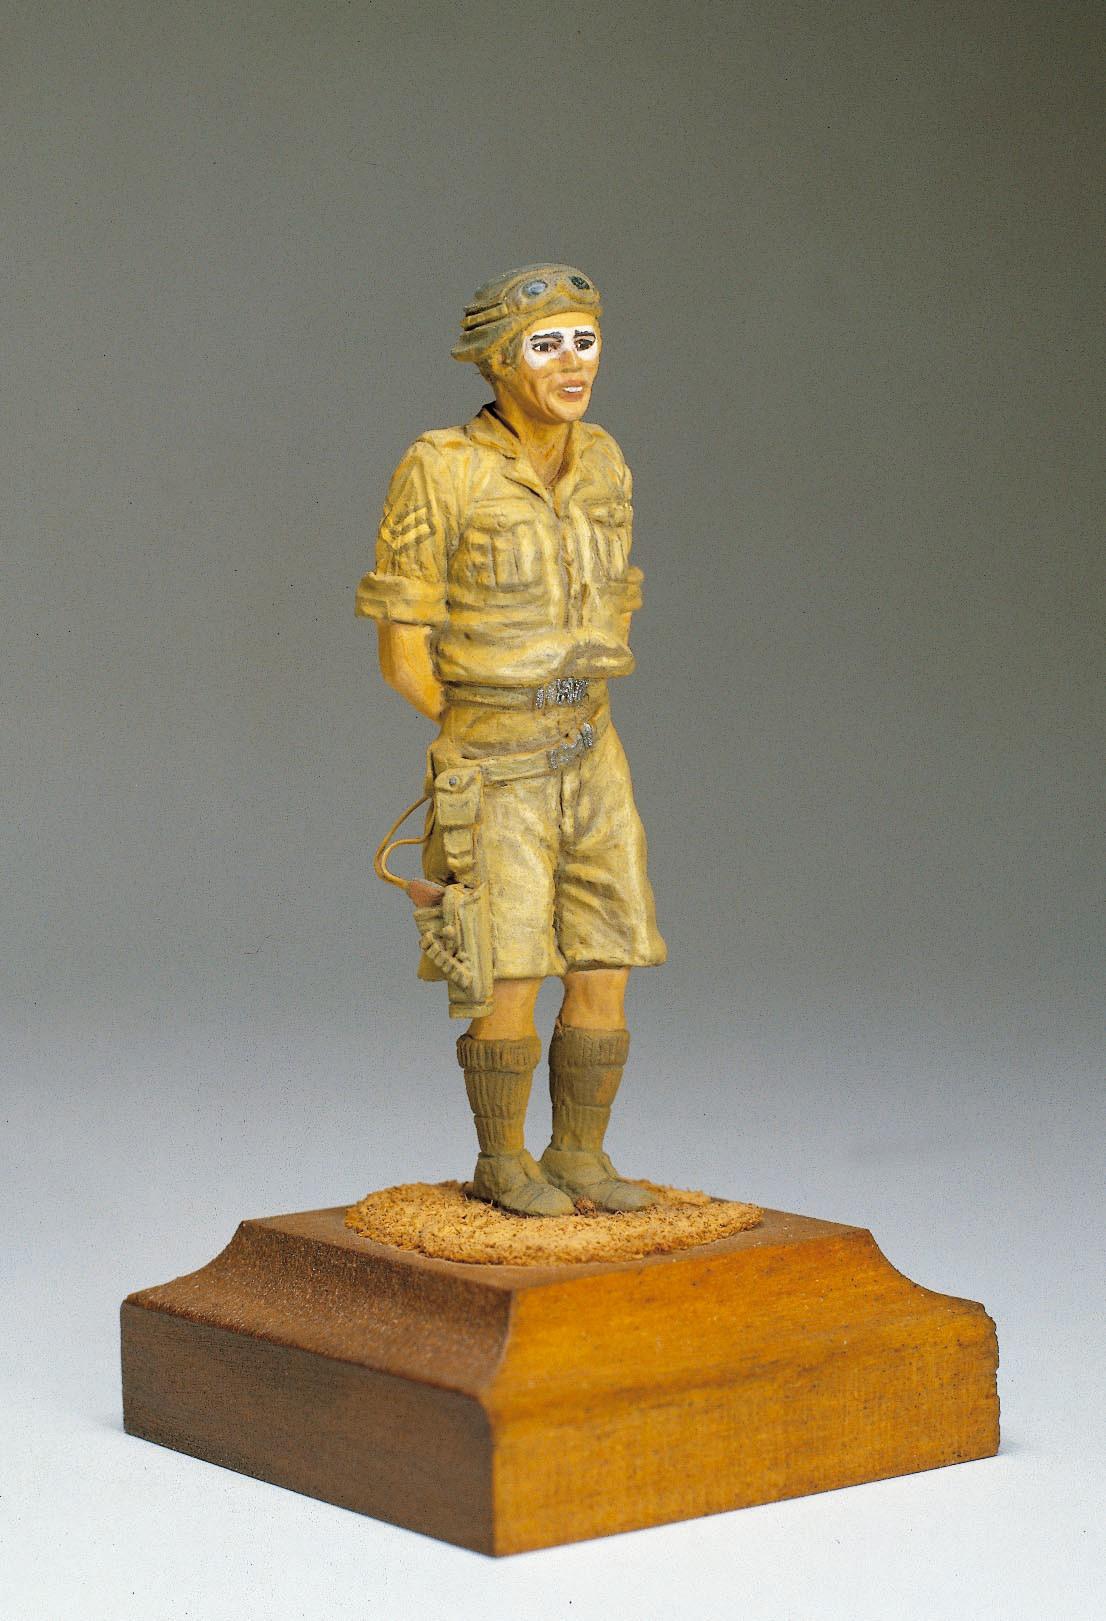 N. African British Tanker Figurine (Amati)